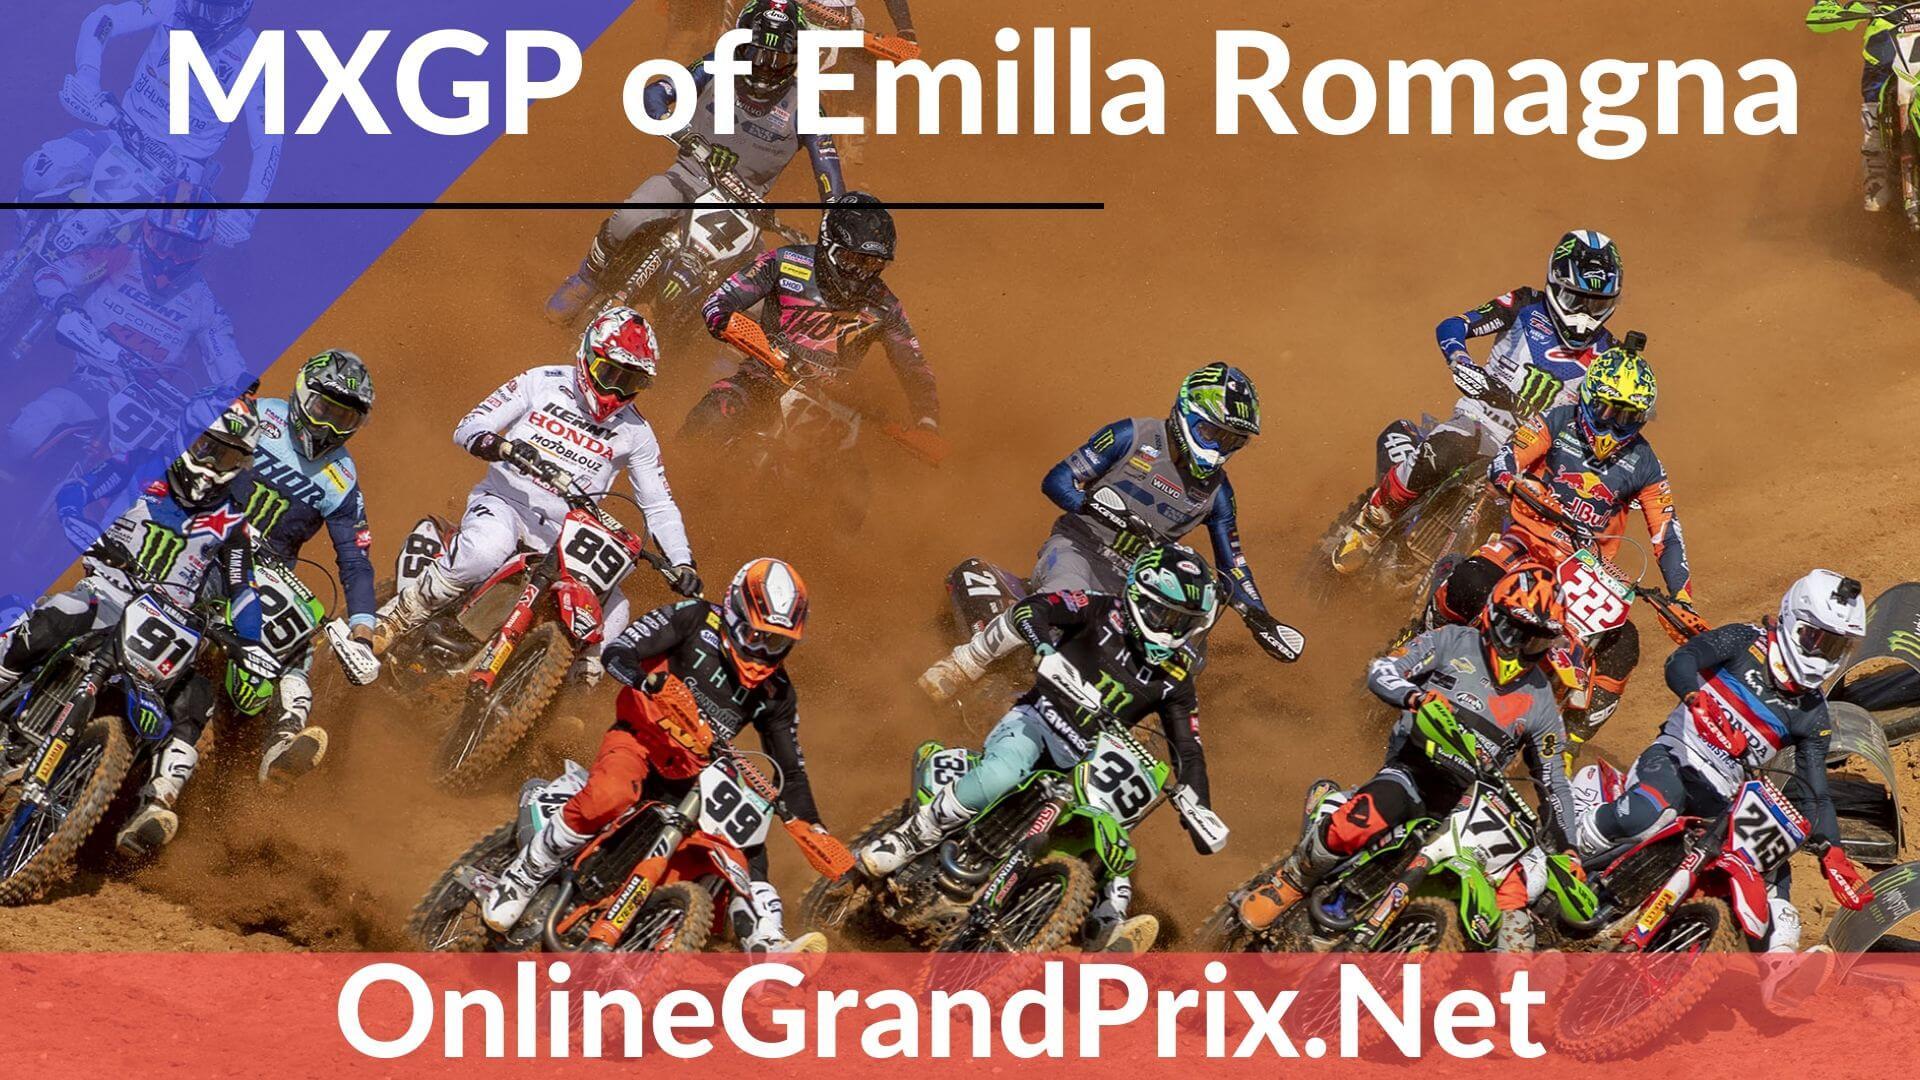 Emilla Romagna MXGP Live Stream 2020 | FIM MotoCross WC